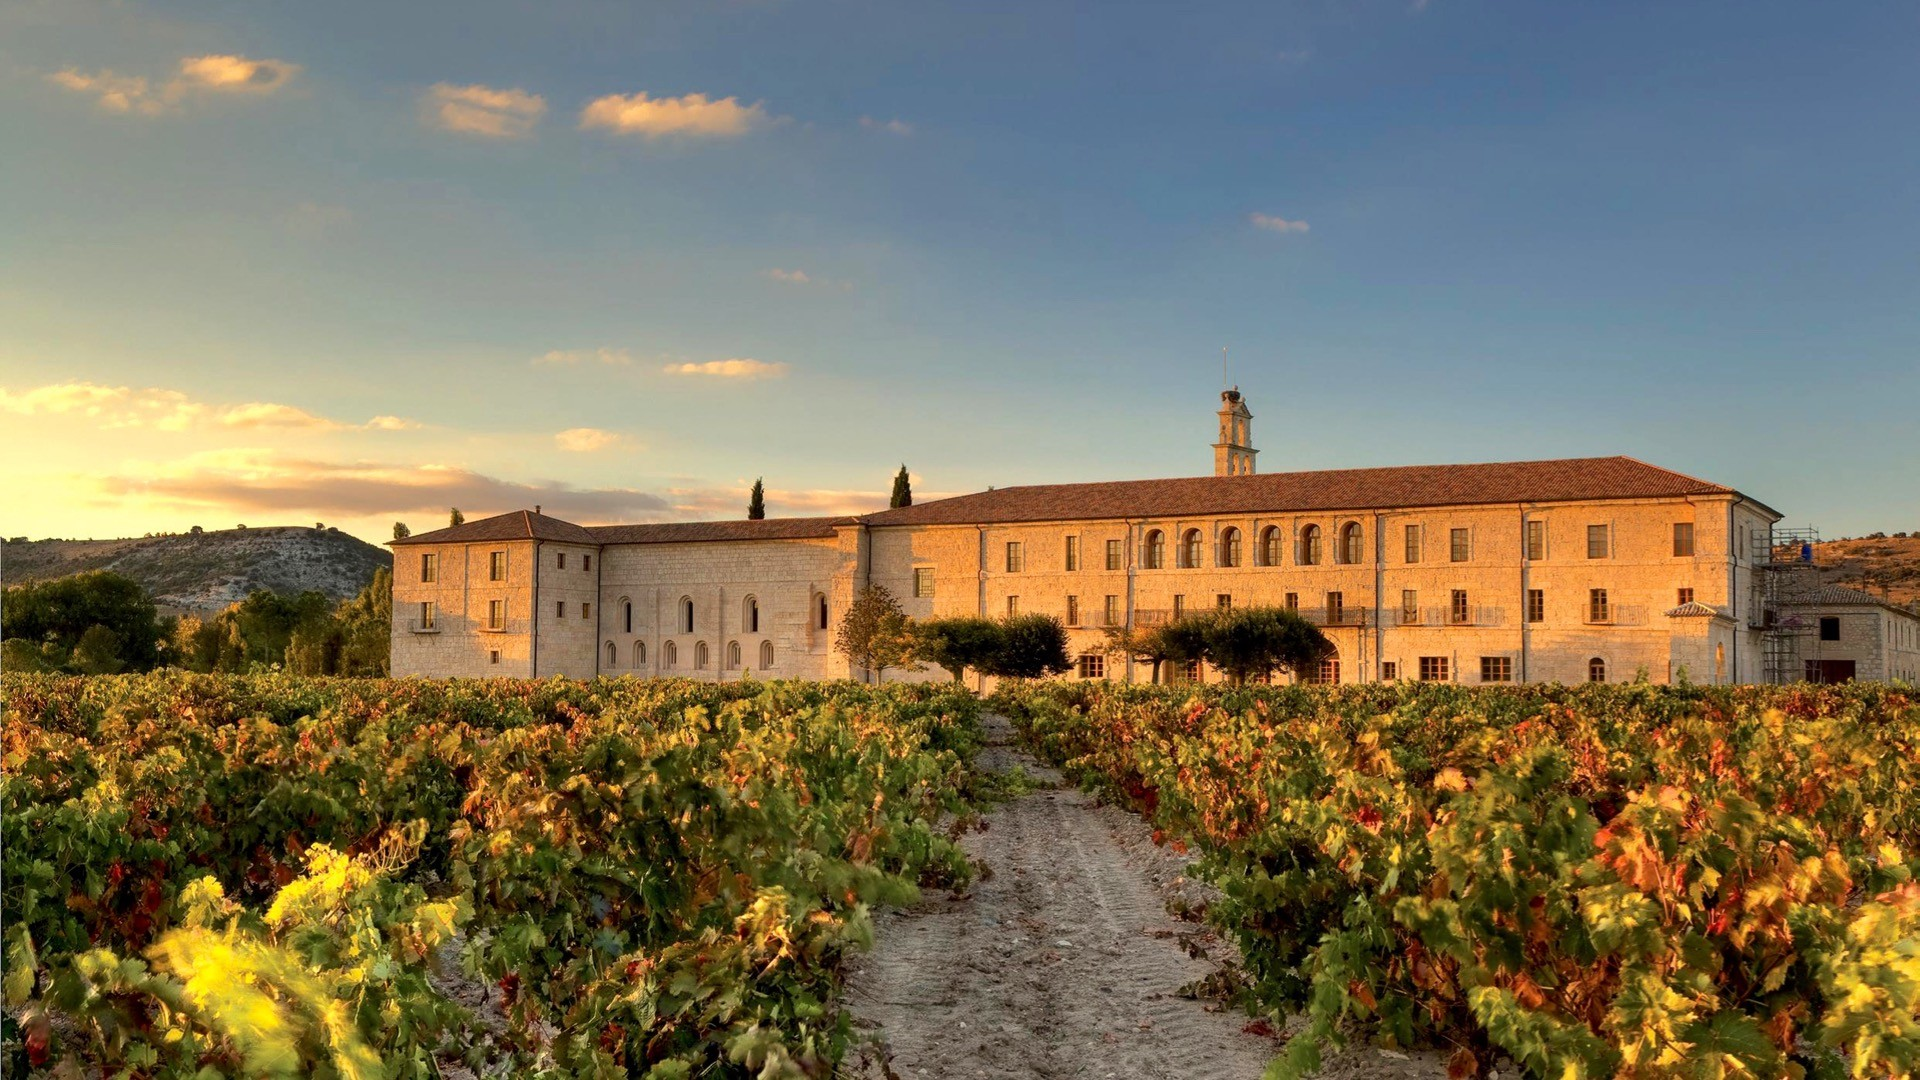 El Santuario' Wellness Spa opens in Spain